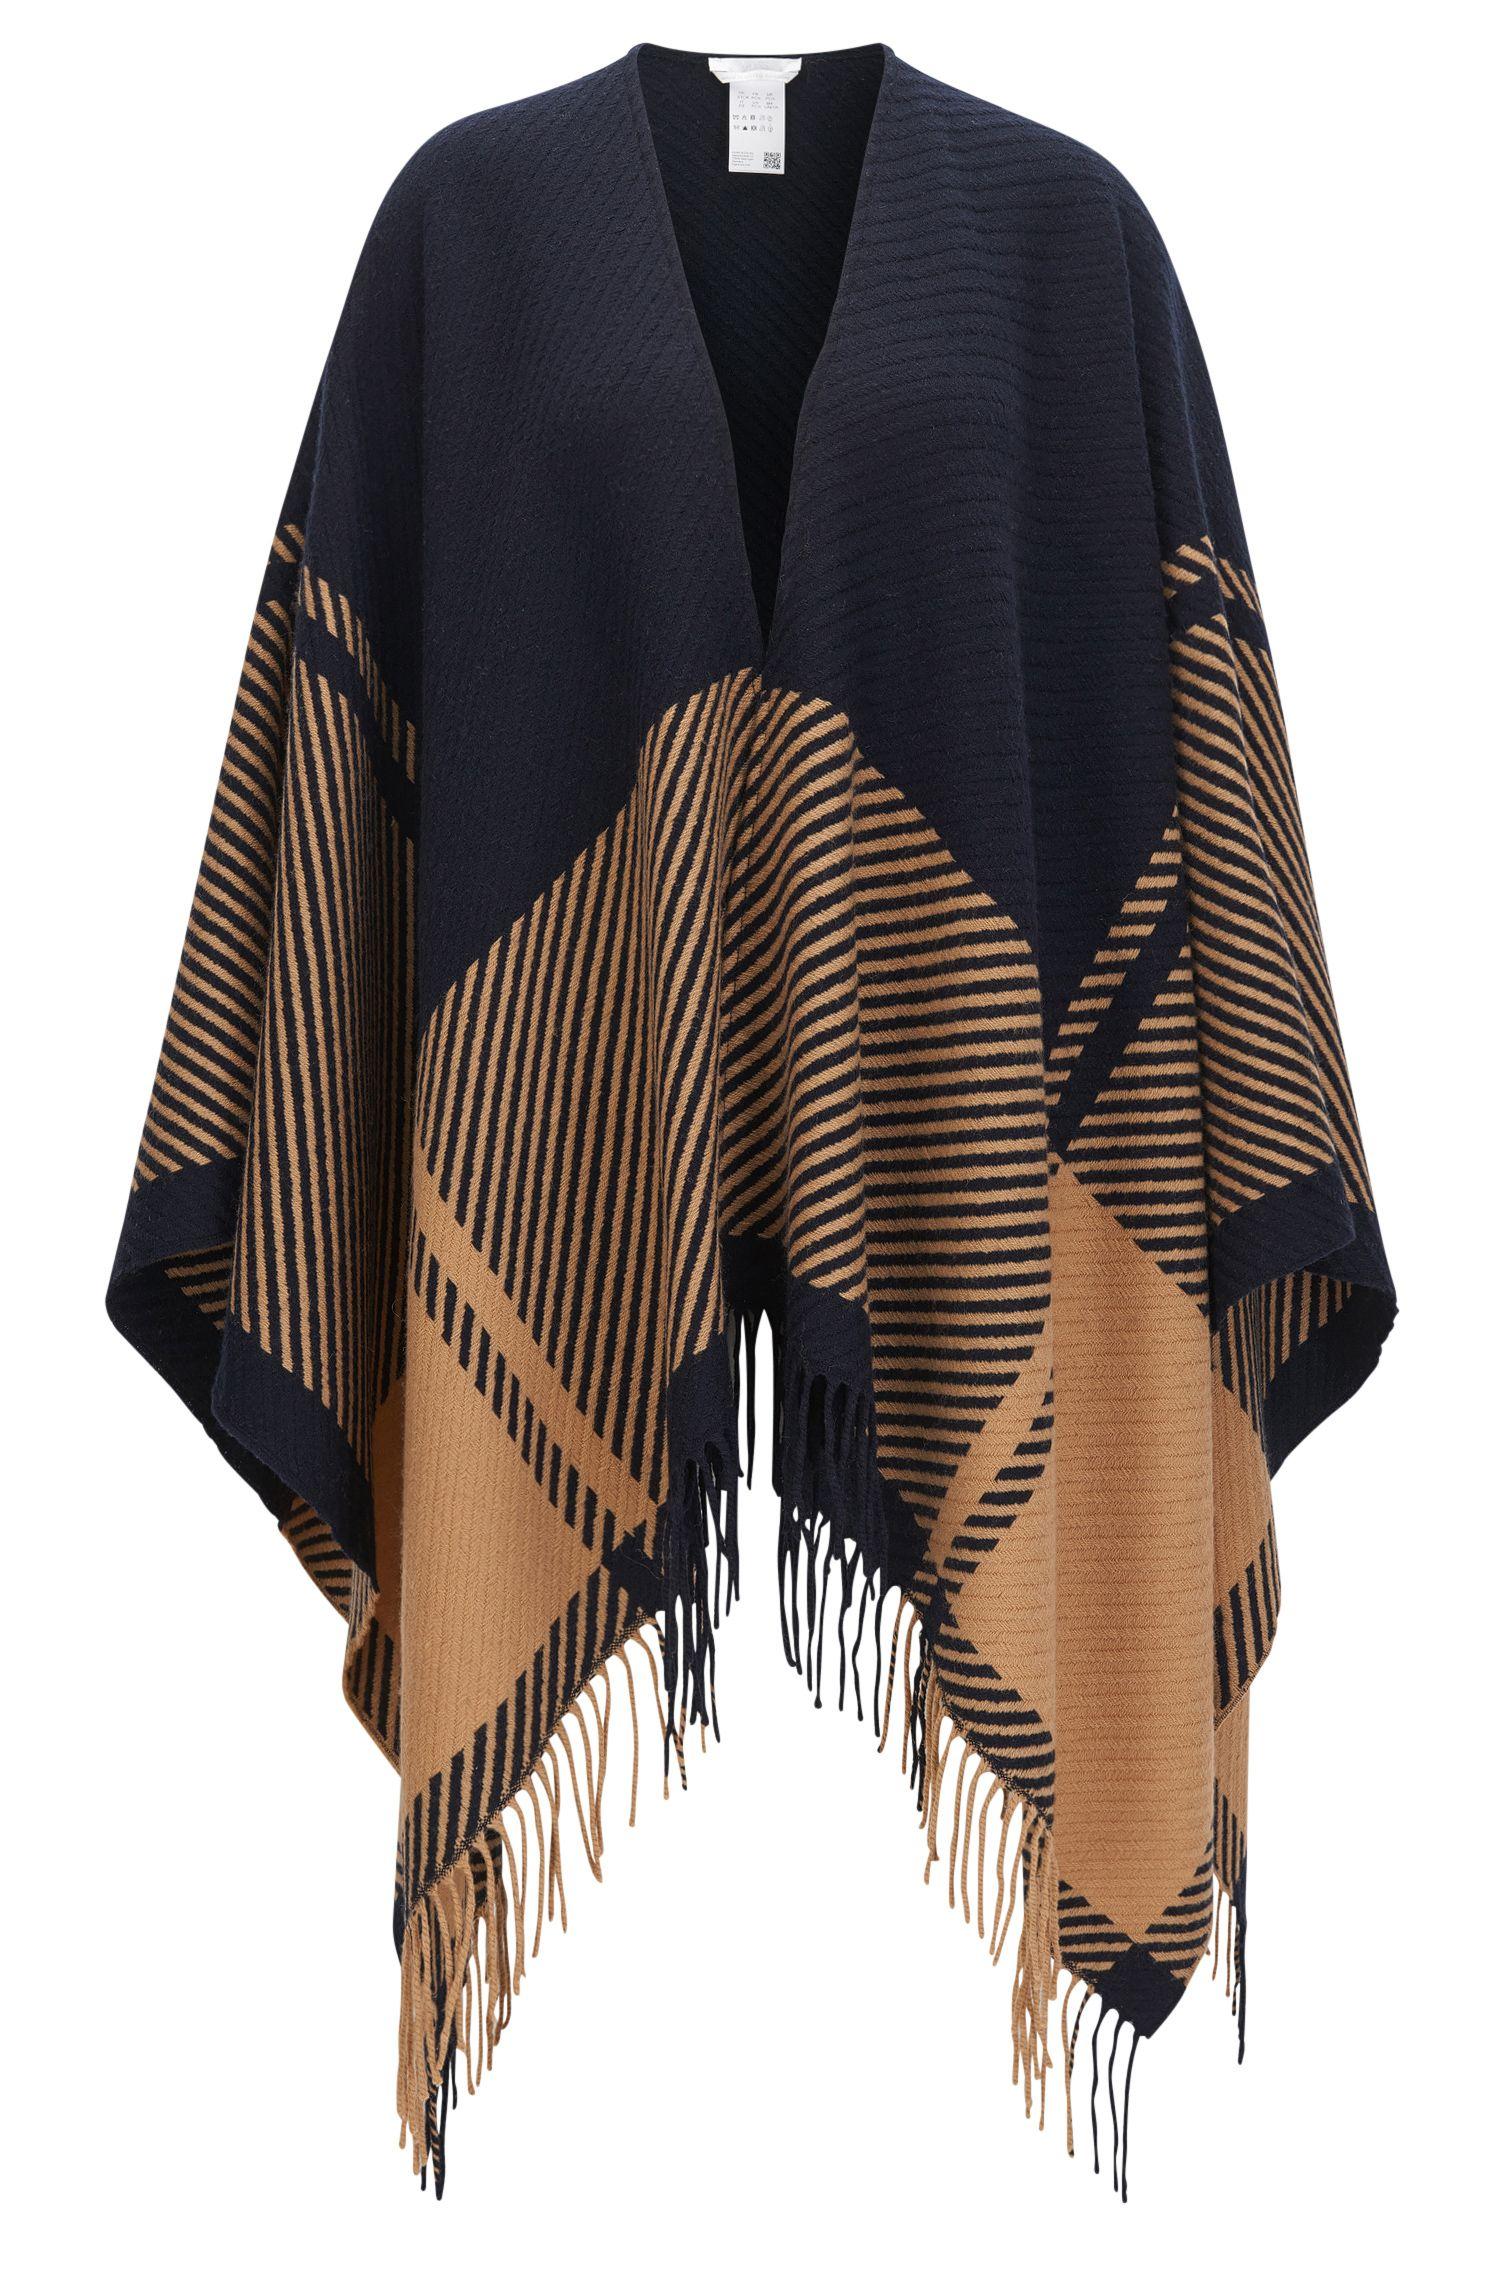 Plaid Virgin Wool-Cashmere Shawl | Lamiky